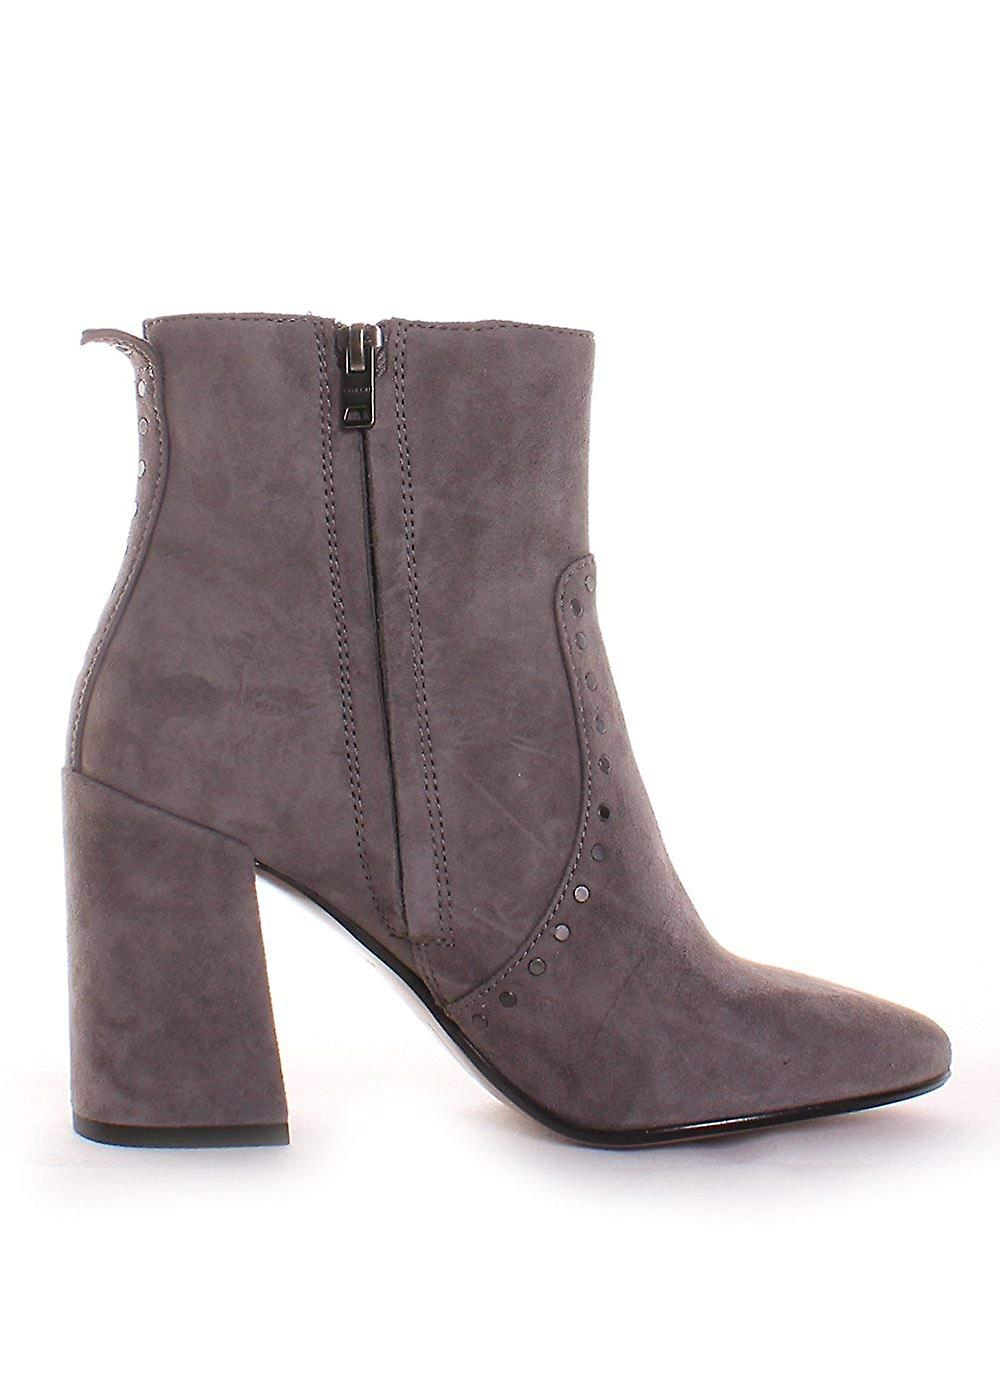 Coach Womens Farrah Bootie Closed Toe Mid-calf Fashion Boots